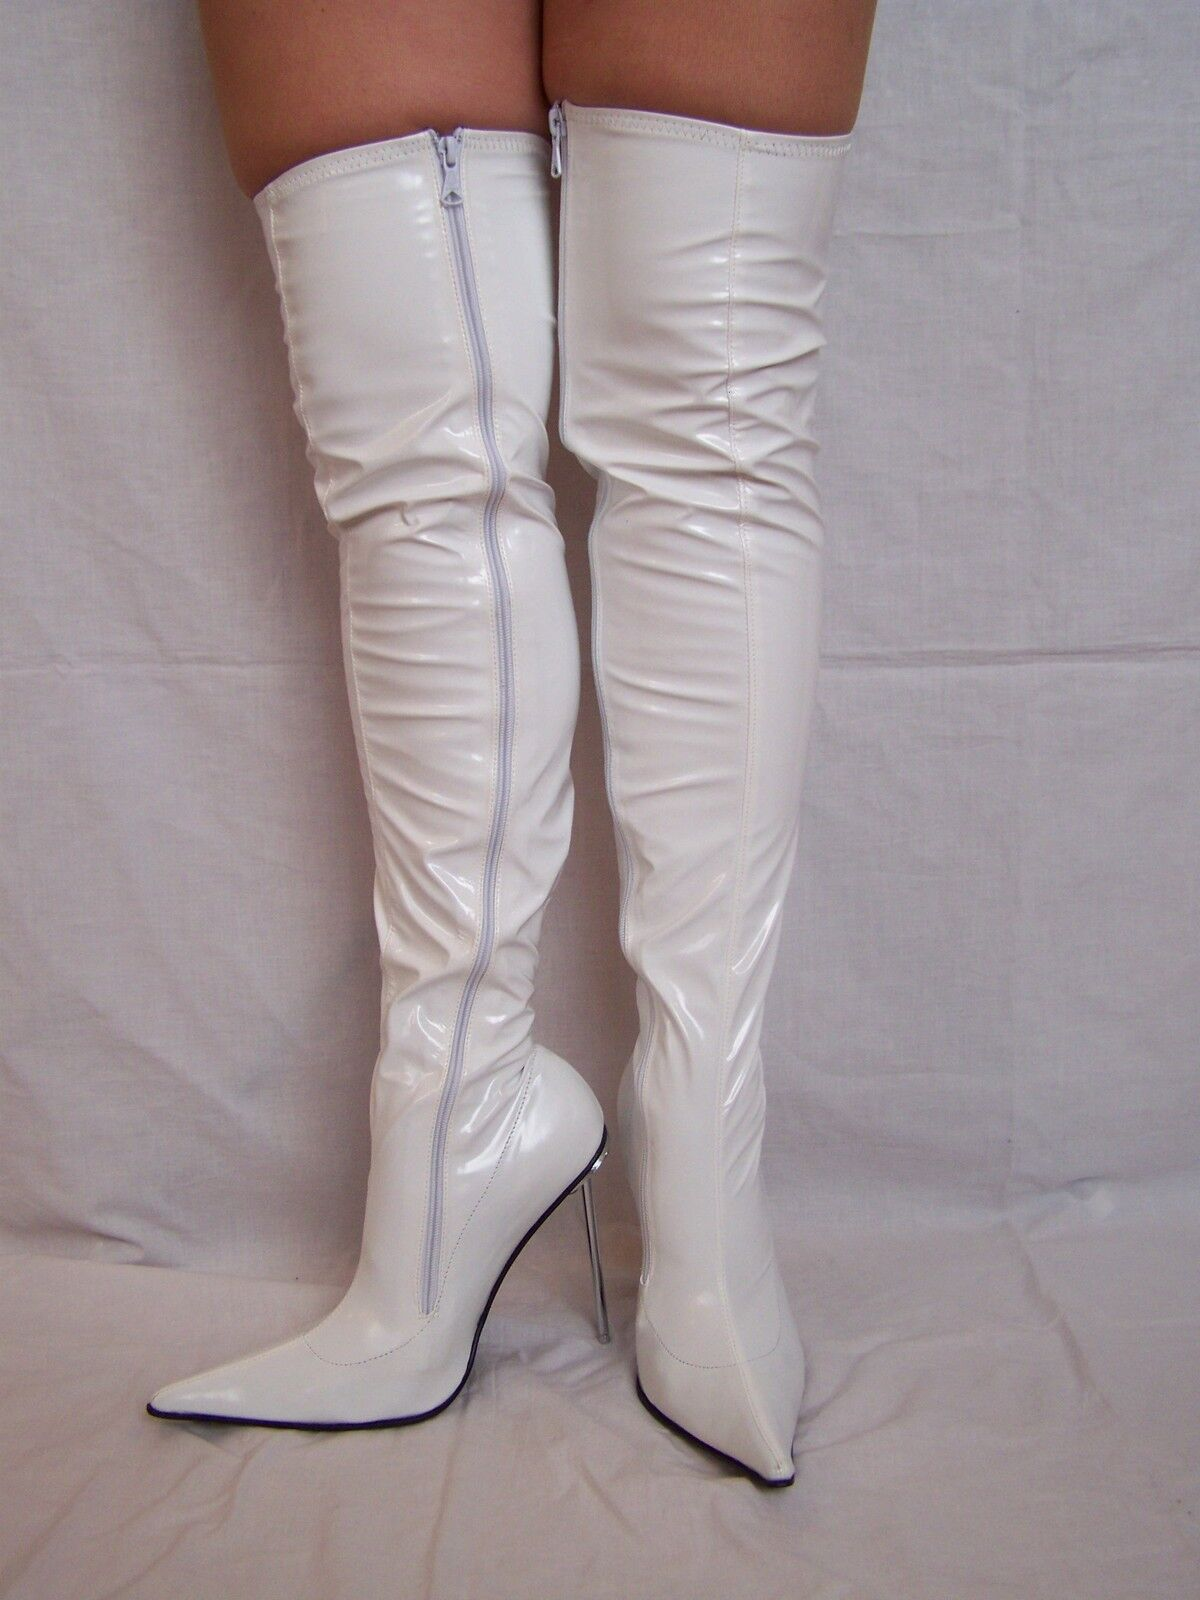 High heels, stiefel latex gummi -Größe 35-47 35-47 35-47 producer -Polen FASHION STYLE 904940